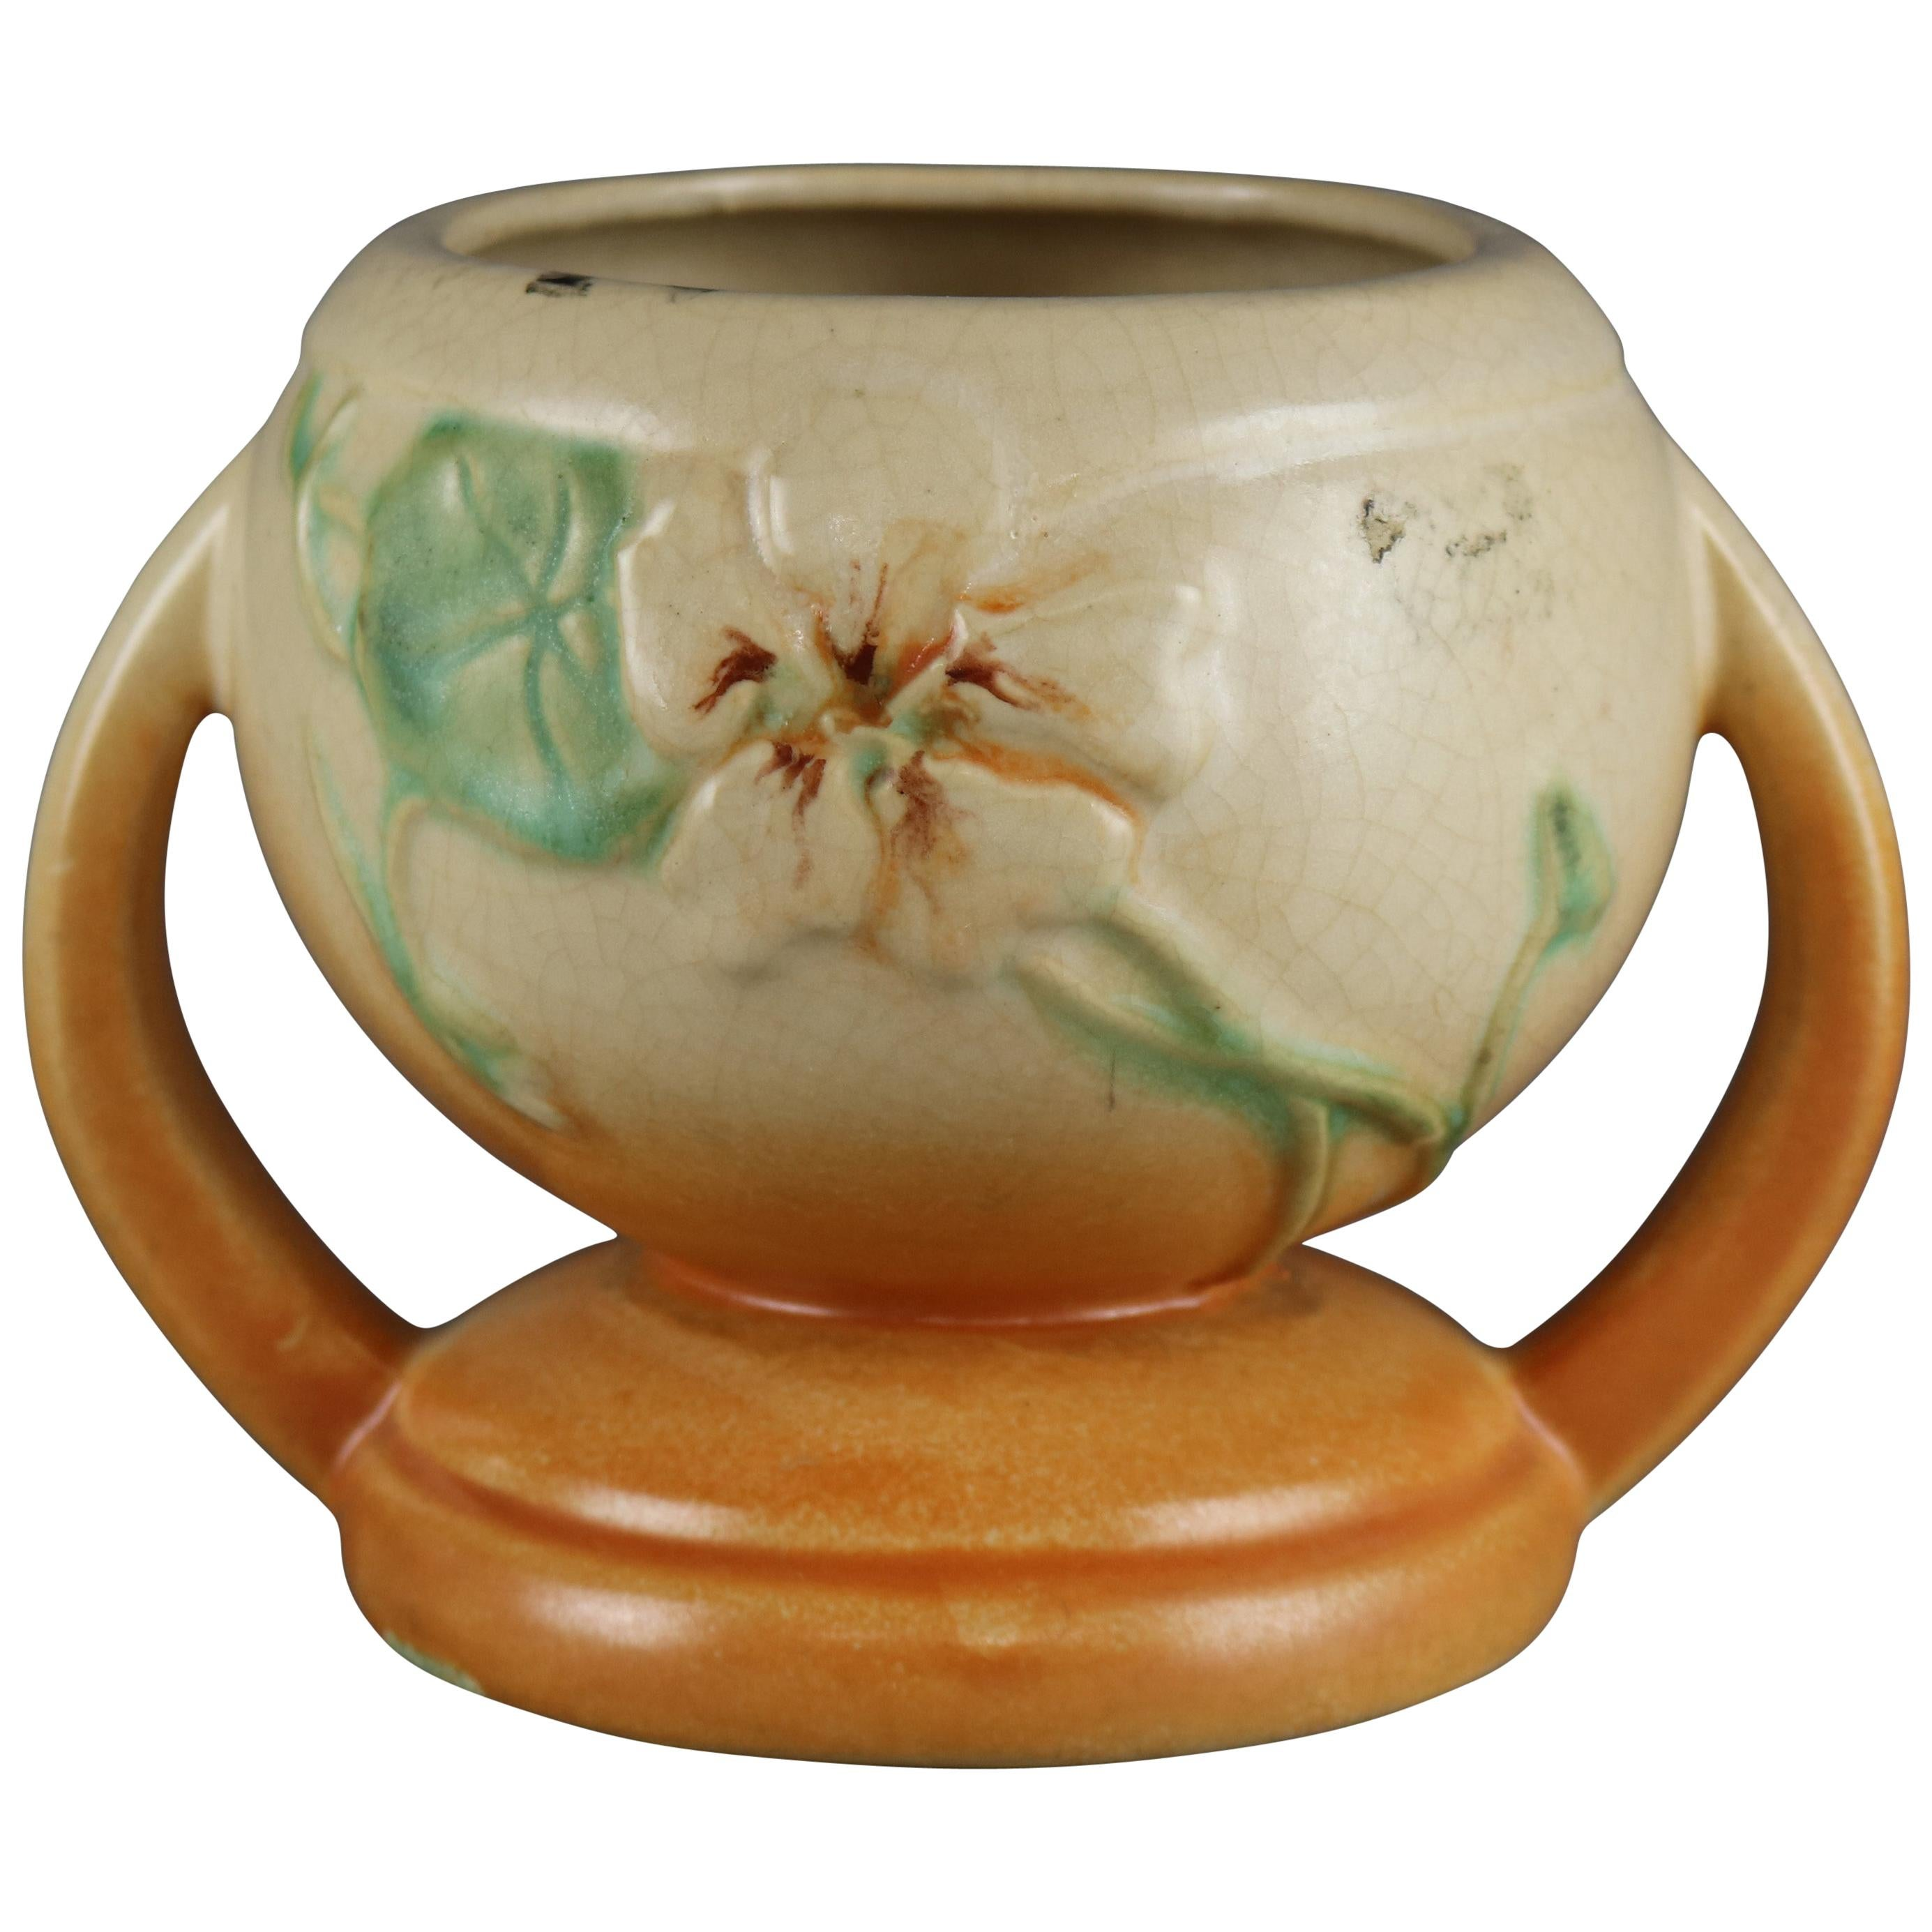 Antique Weller Floral Art Pottery Double Handled Vase, Circa 1930